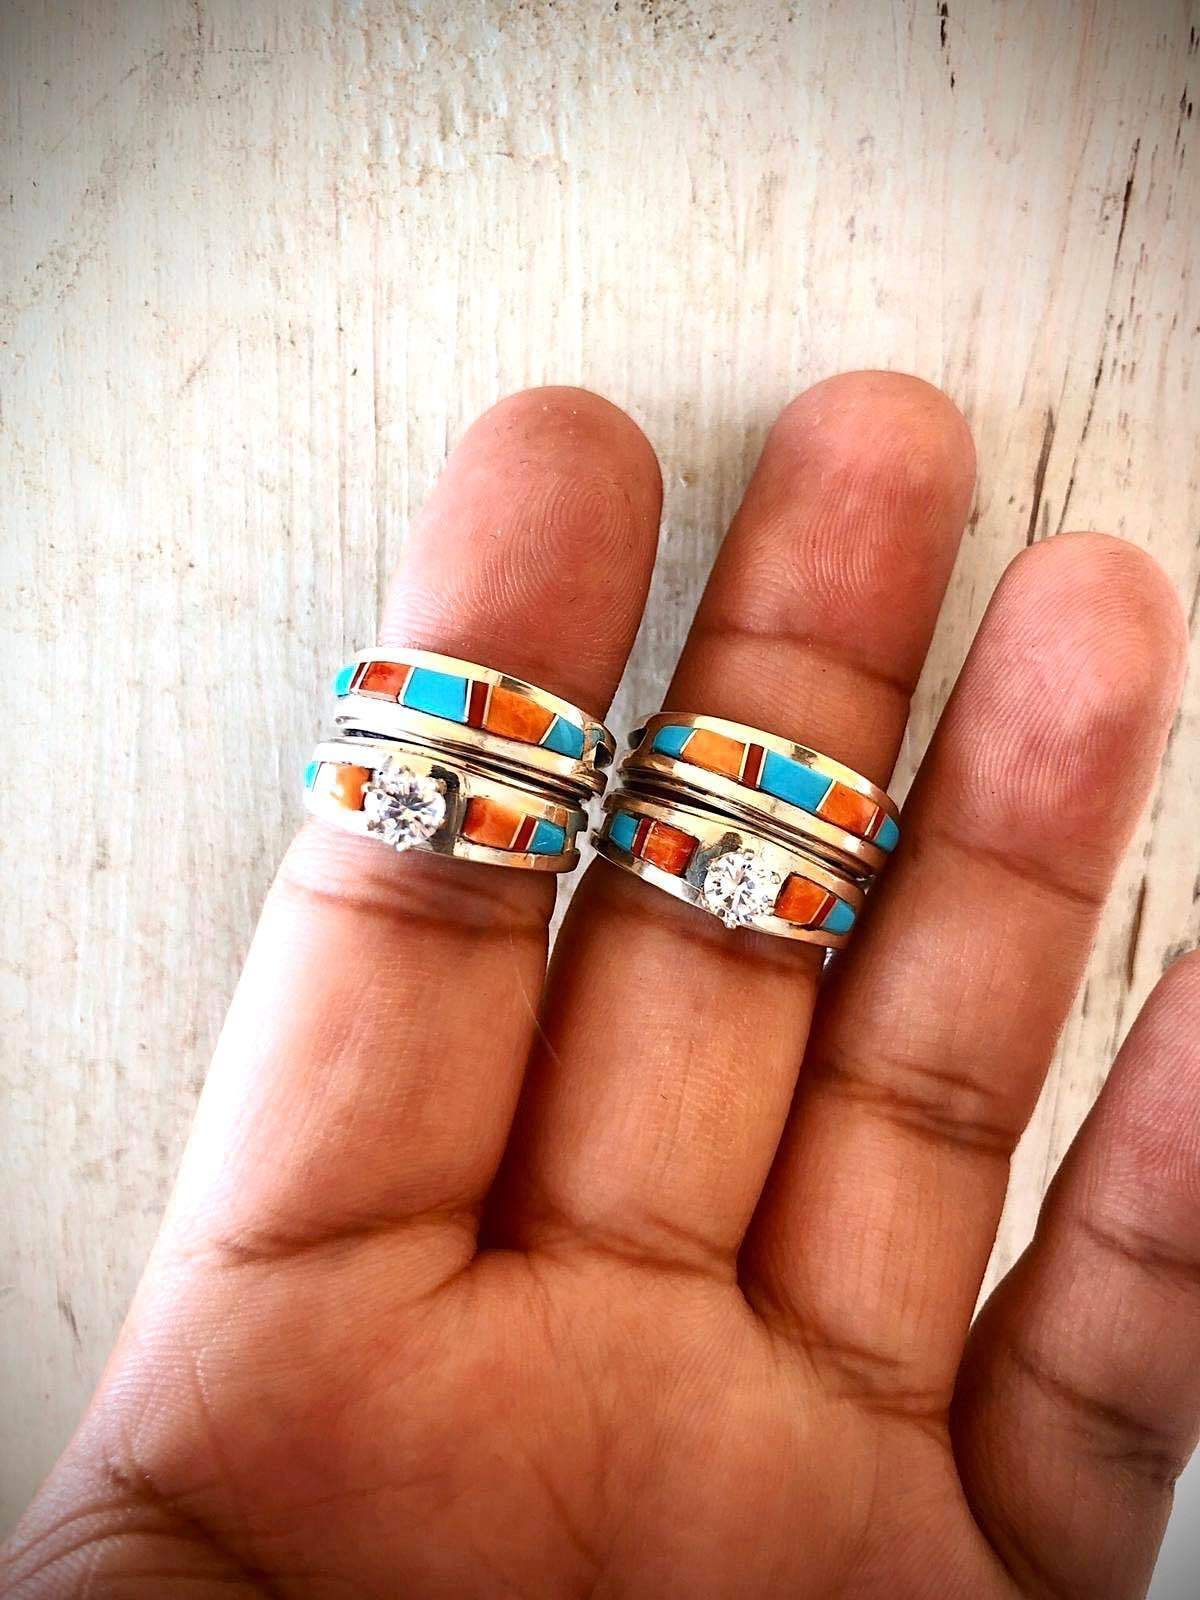 Pandora Jewelry 60% OFF!> SPINEY MIX Turquoise Weddi Infinity ring ✨ turquoise rings wedding ring eternity band boho jewelry boho rings turquoise #Mix #SPINEY #Turquoise #weddi #Jewelry #PANDORA #style #Accessories #shopping #styles #outfit #pretty #girl #girls #beauty #beautiful #me #cute #stylish #design #fashion #outfits #PANDORAbracelets #PANDORAcharm